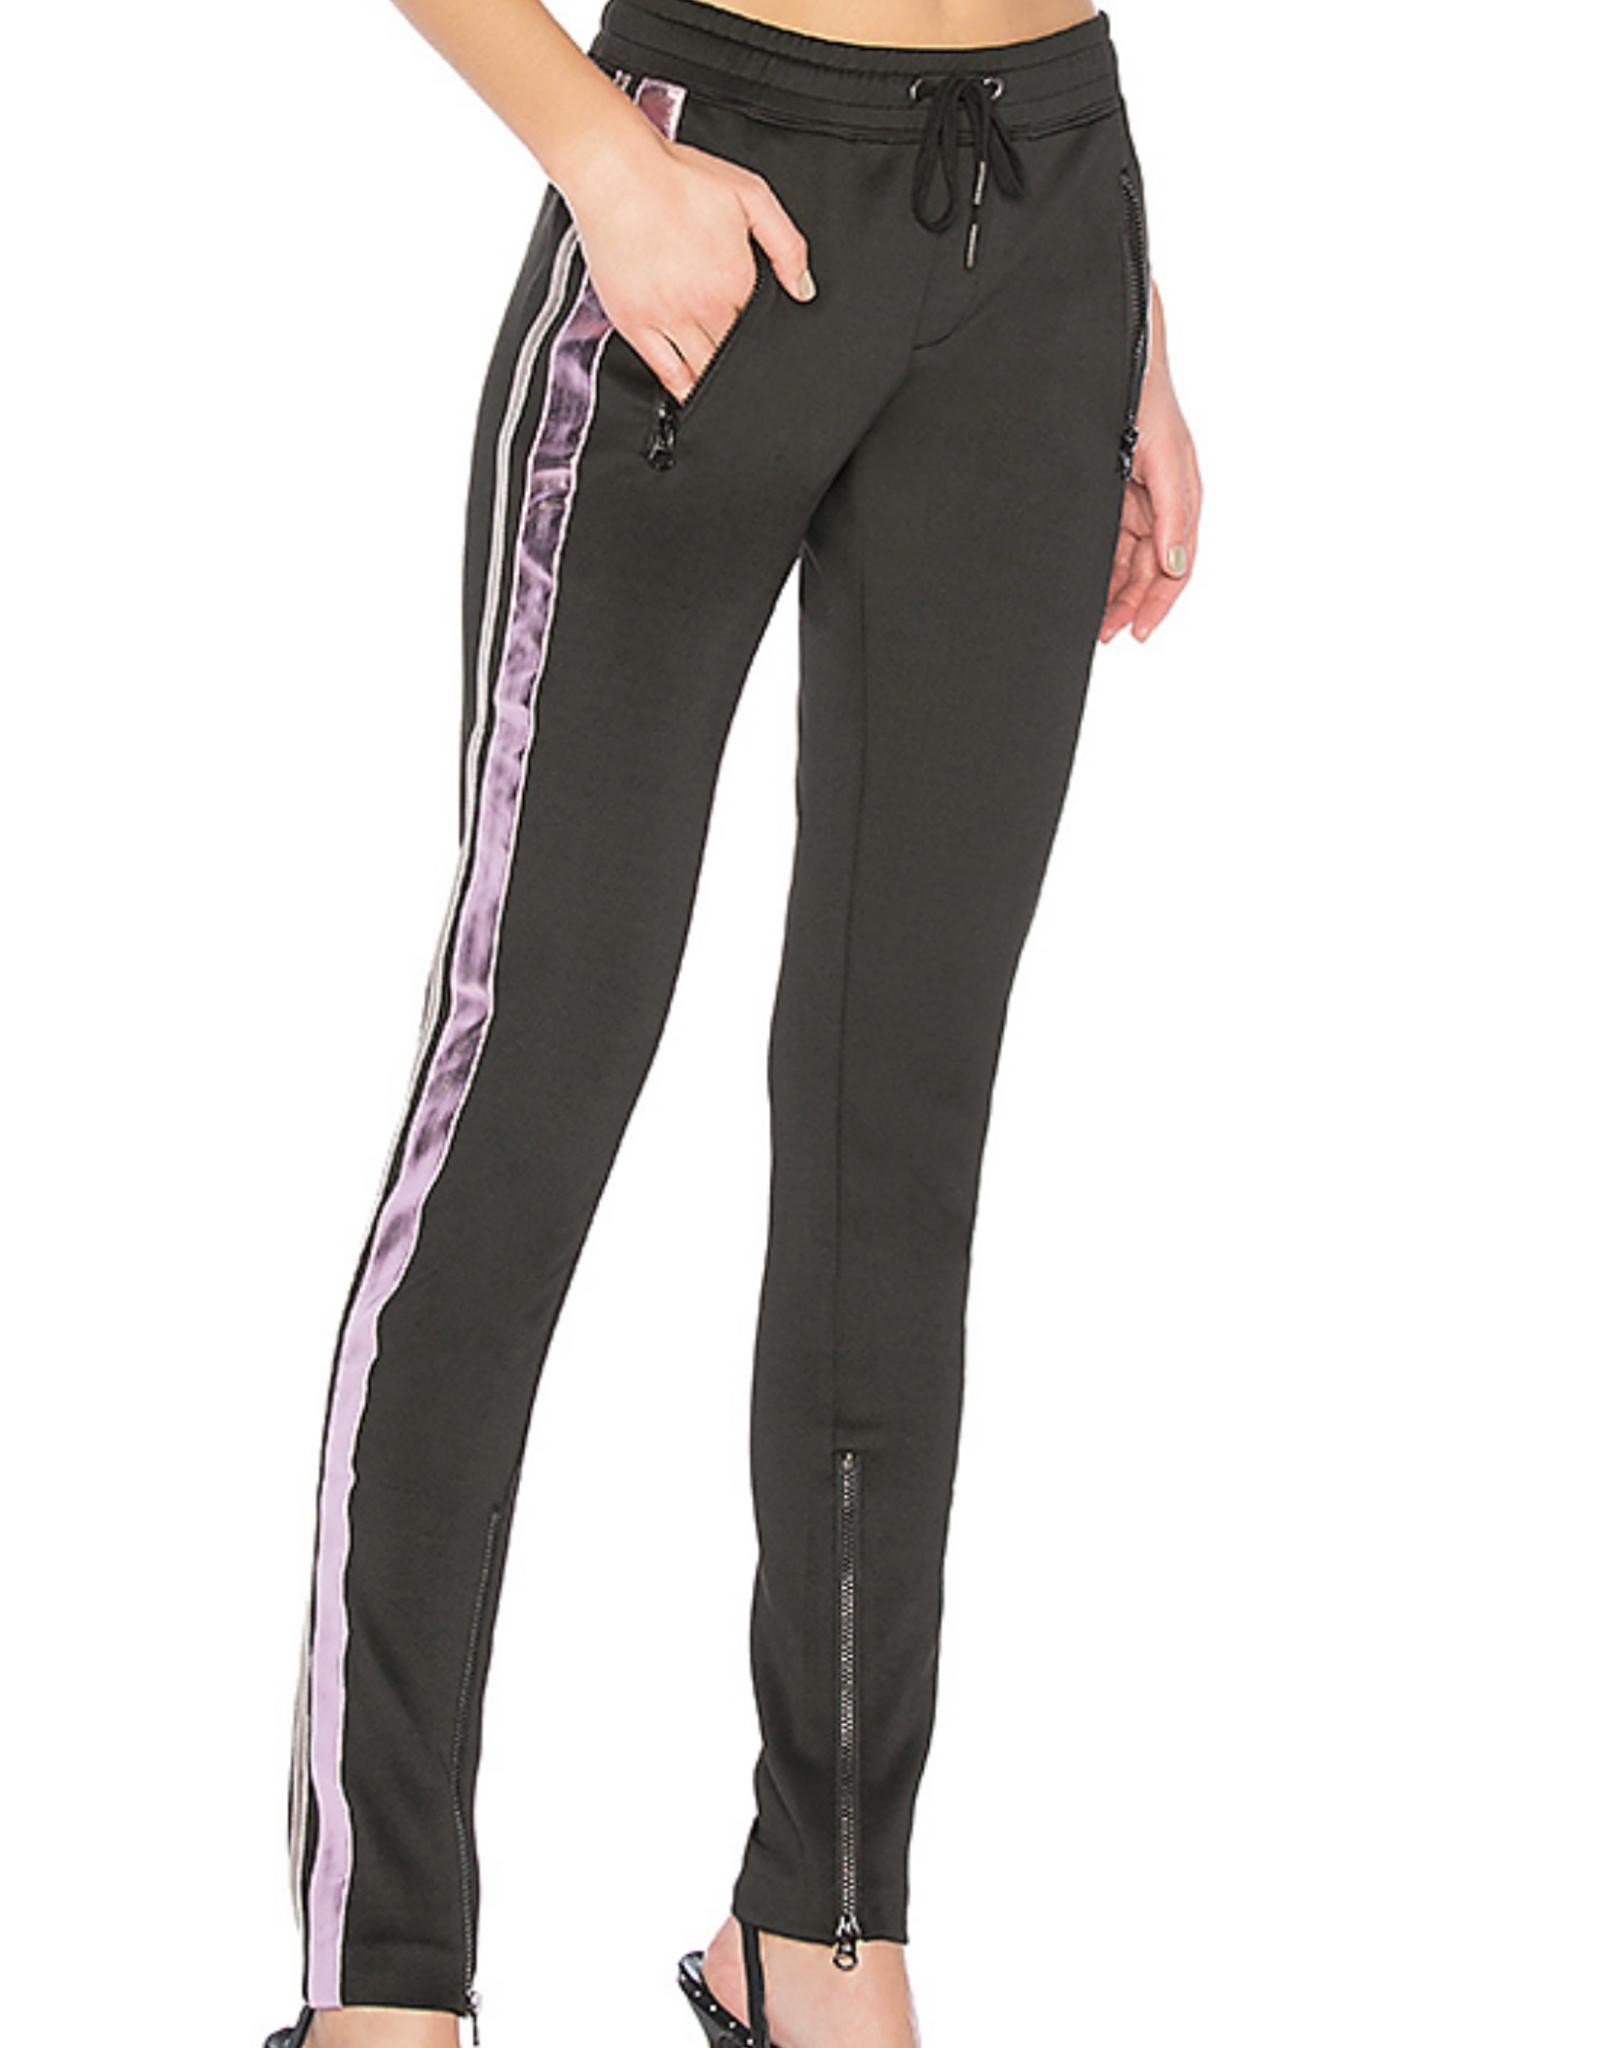 Pam & Gela Black Metallic Contrast Cigarette Pant